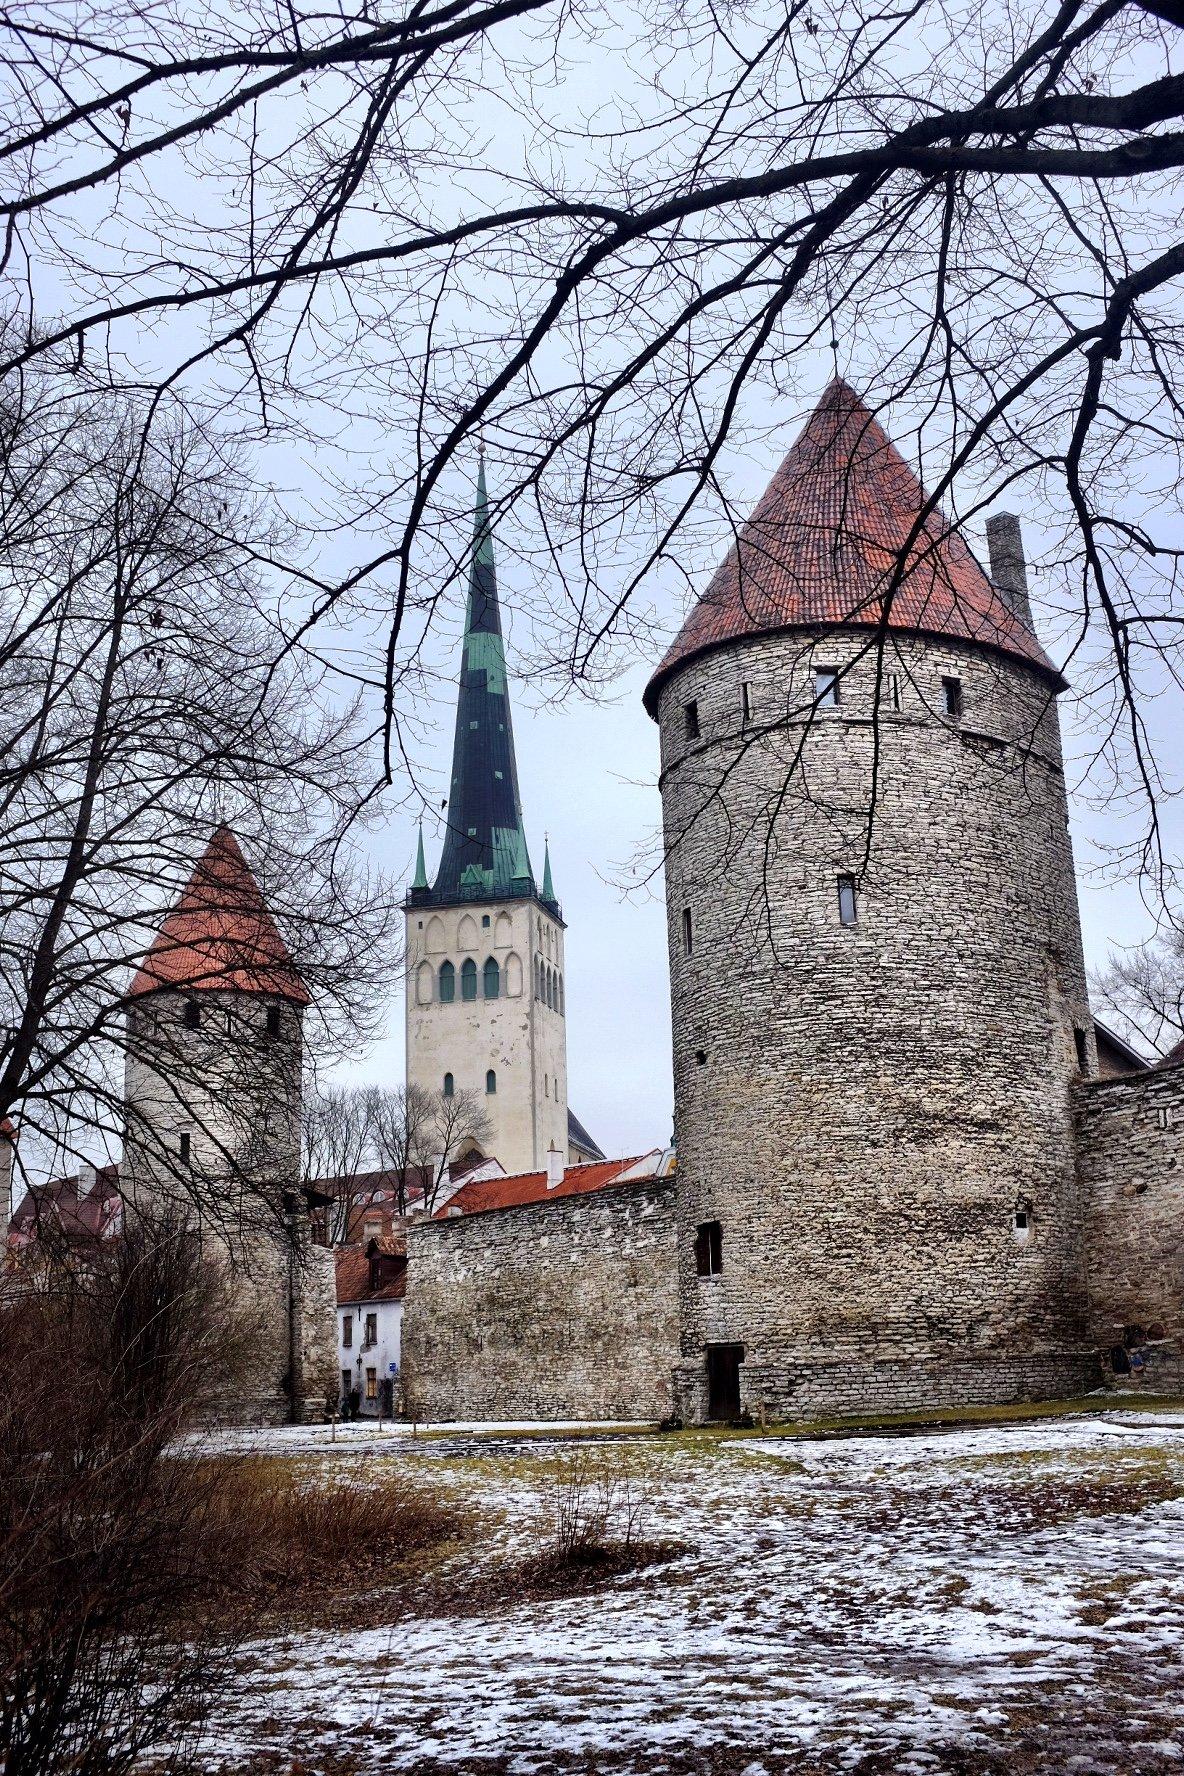 St. Olavs Church and Wall Tower in Tallinn